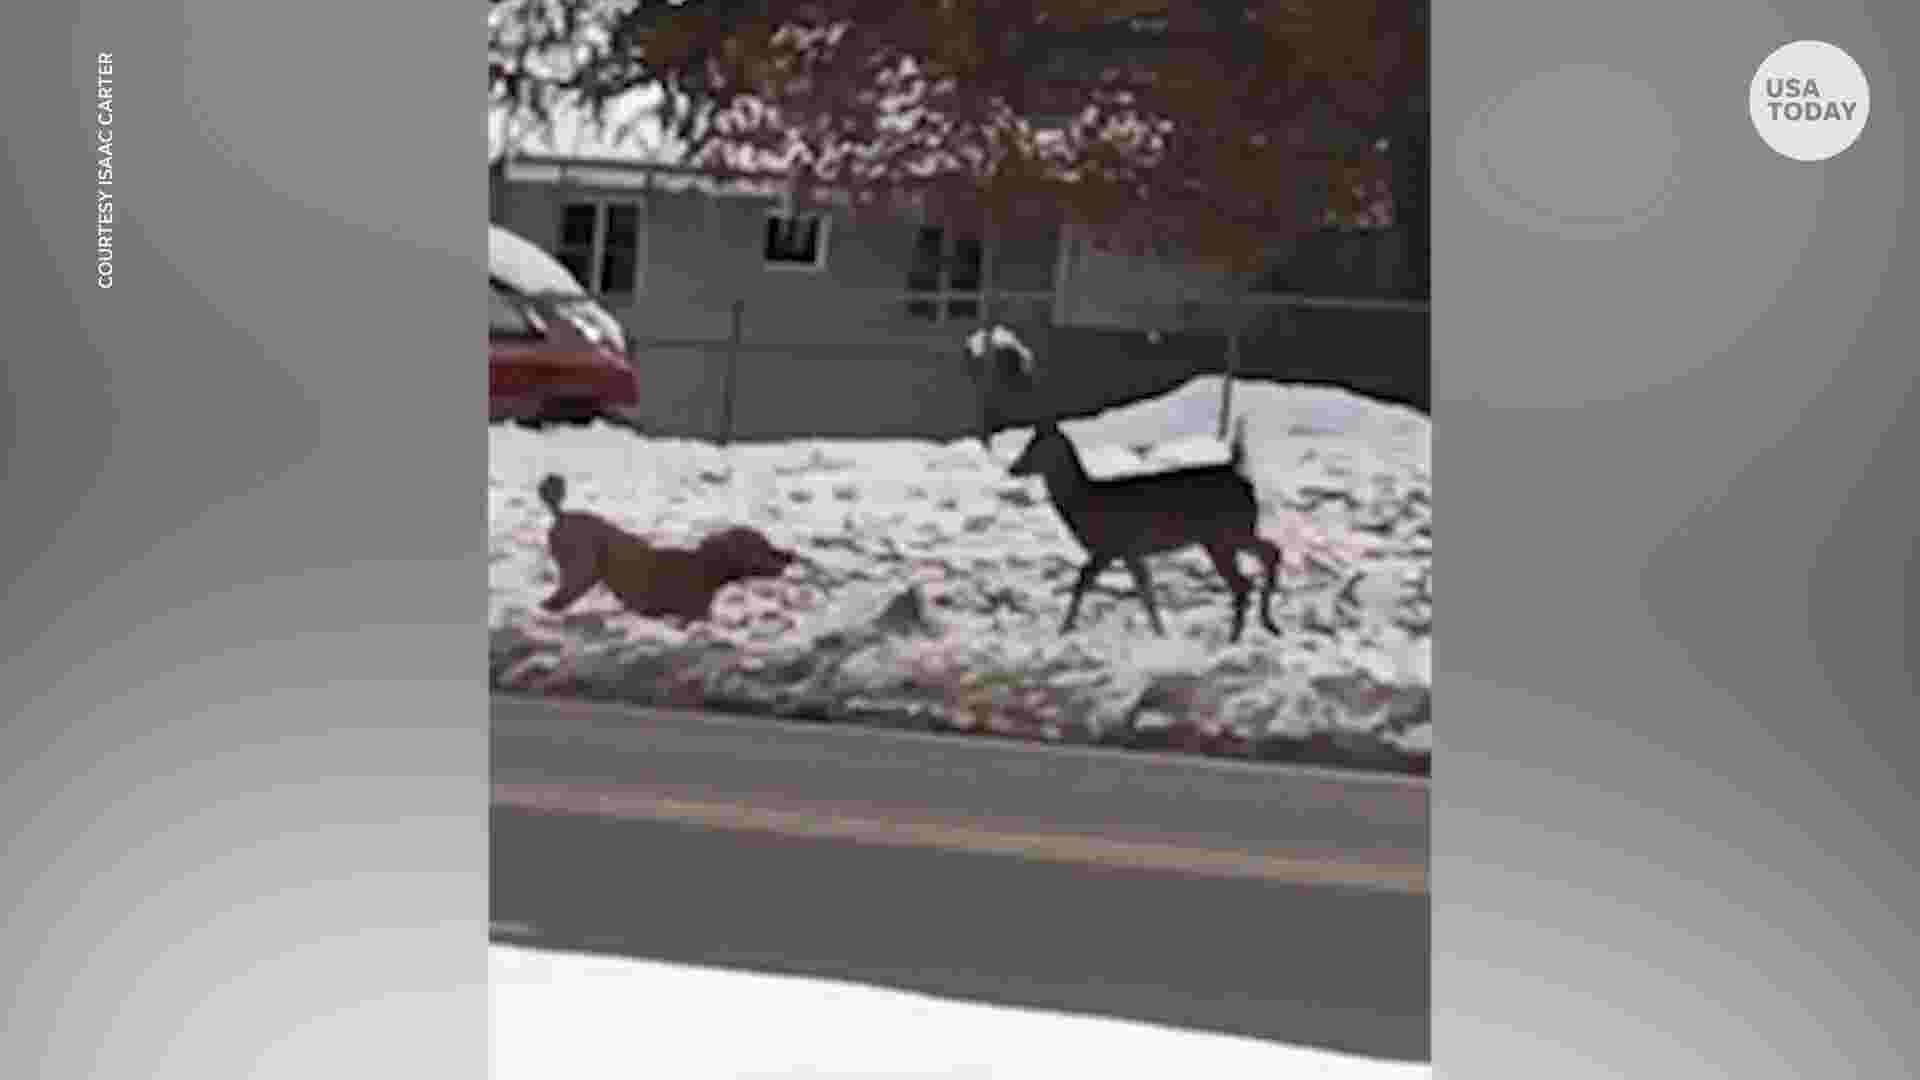 Camera captures unlikely friendship between dog and deer